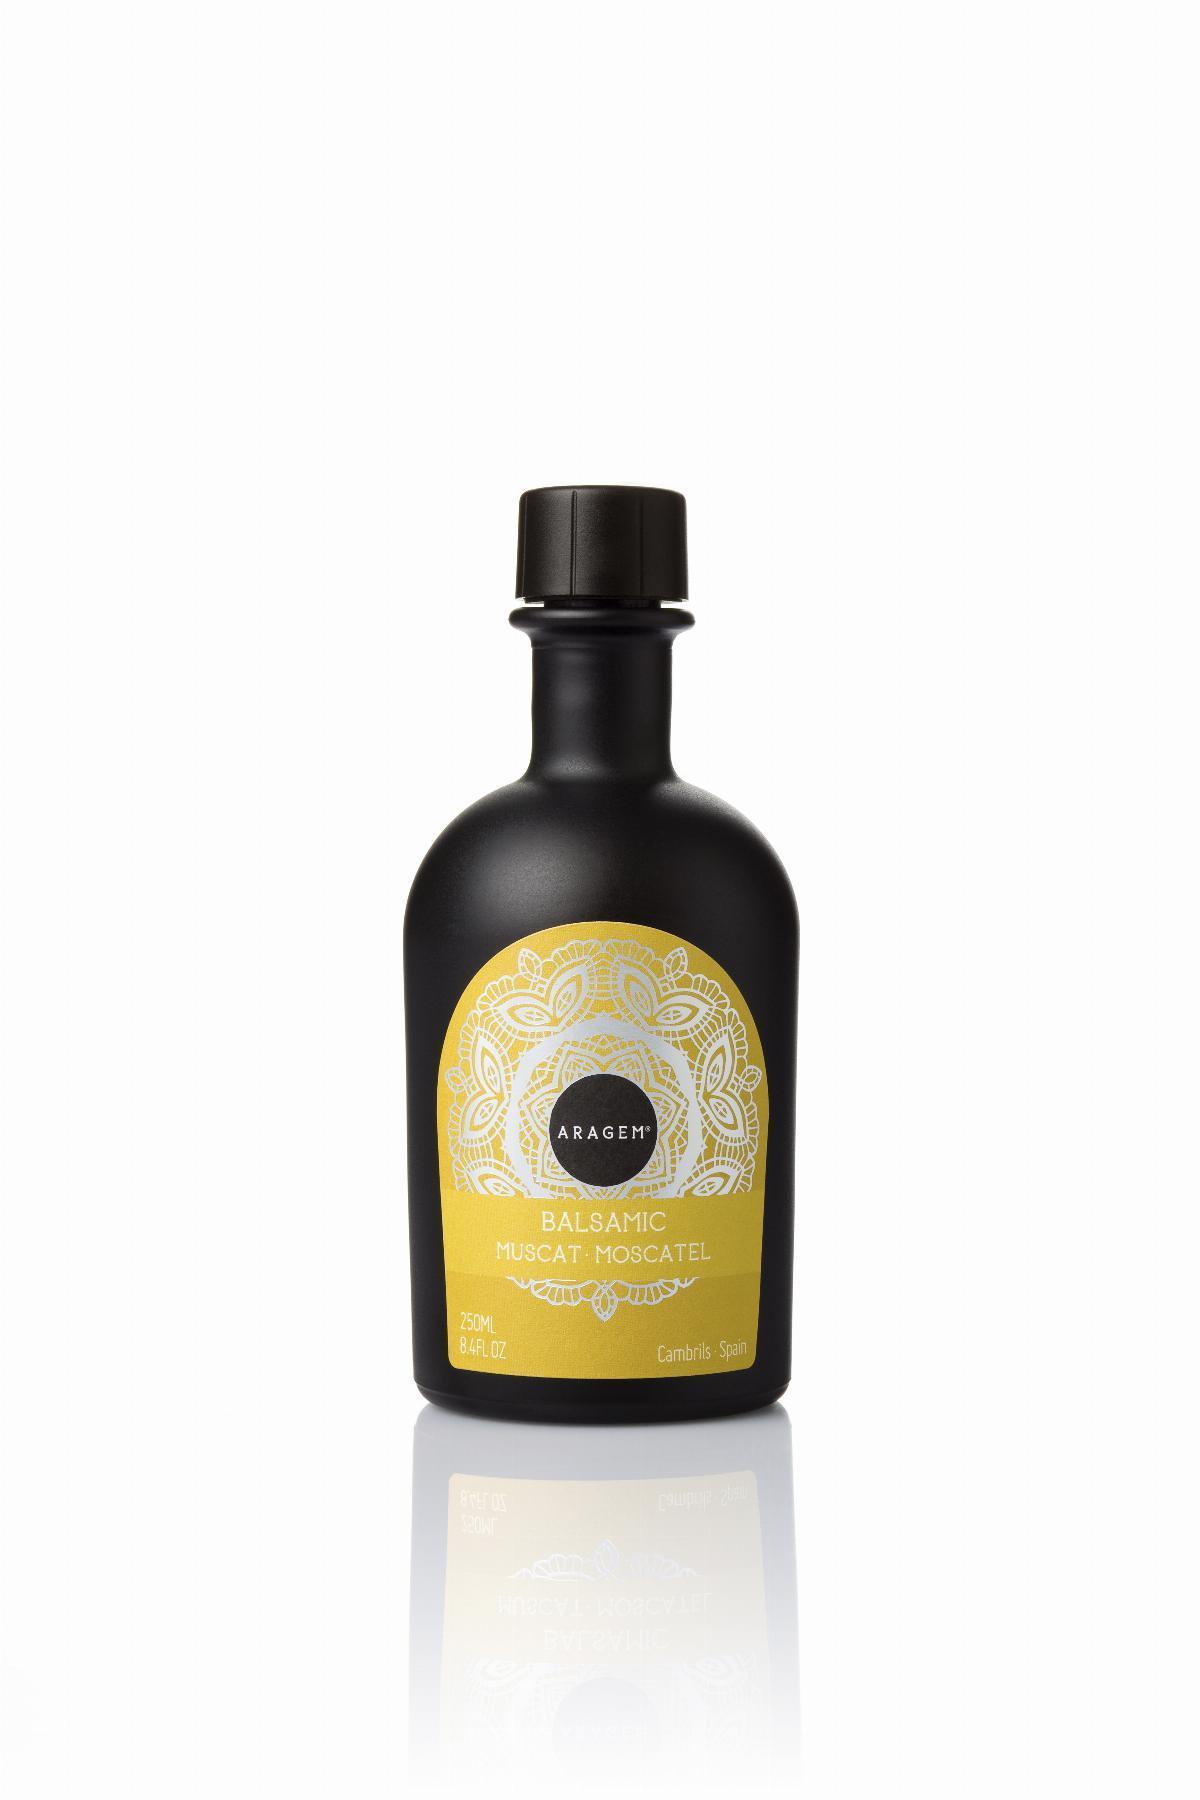 Vinagres - Vinagre Balsàmic Moscatell Aragem, ampolla negra 250ml - Mestral Cambrils